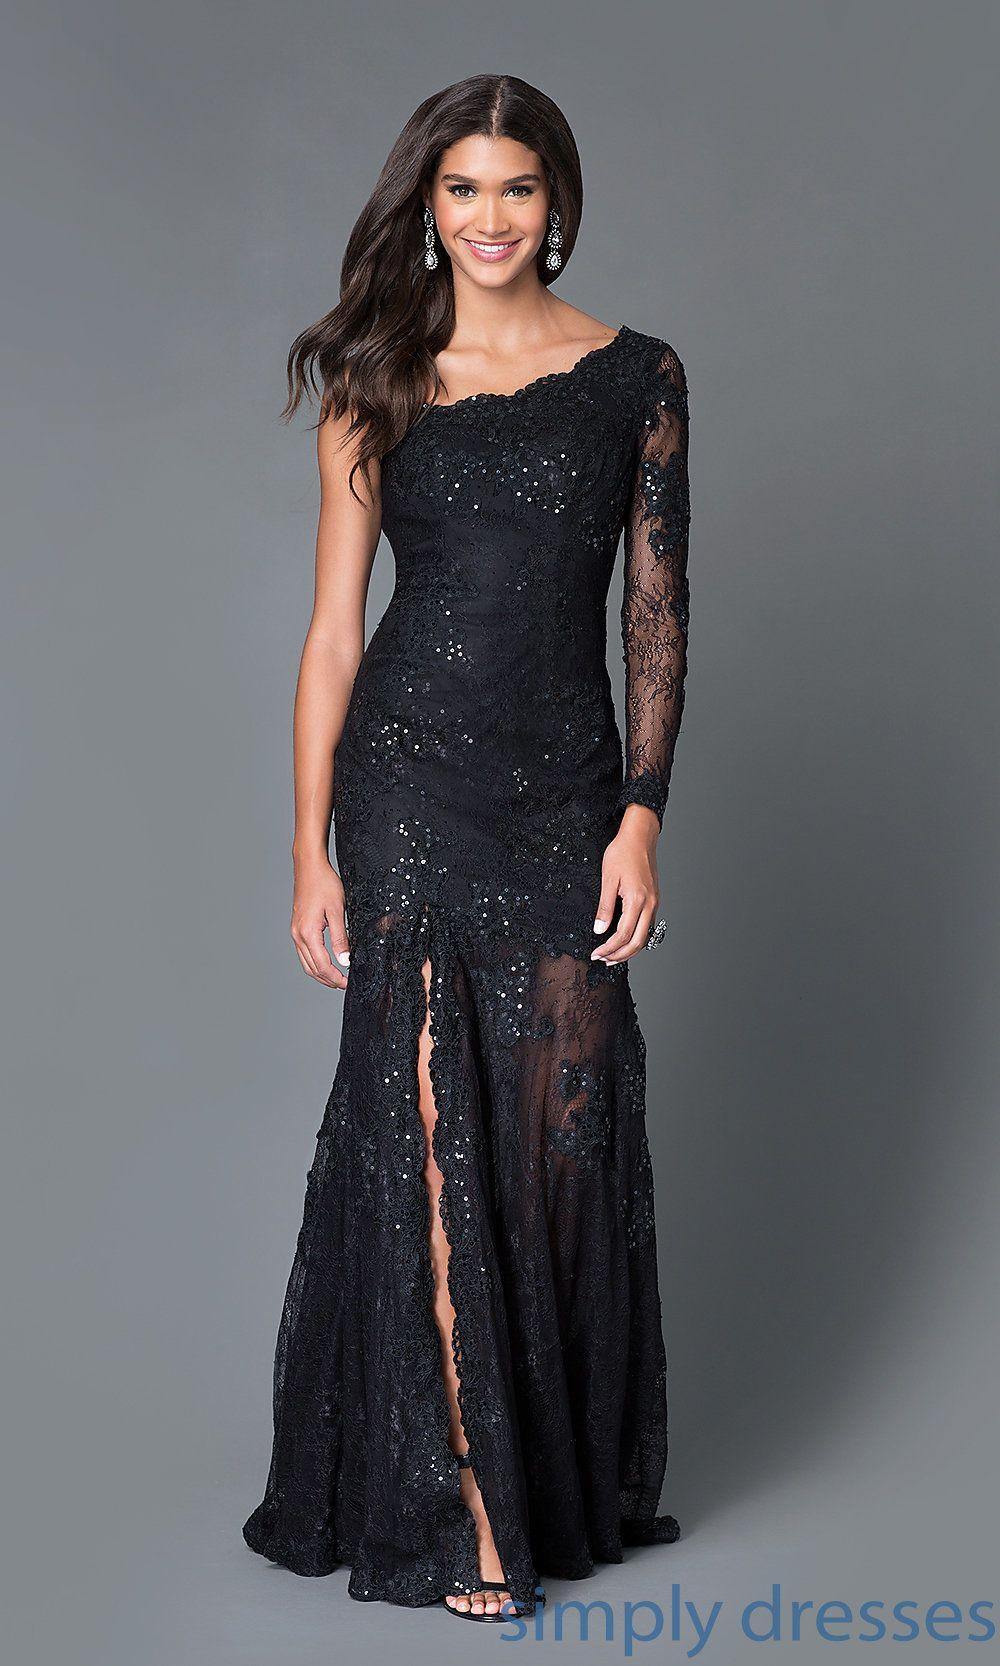 Floor Length Asymmetric Long Sleeve Black Gown Black Lace Dress Long Long Sleeve Black Gown Prom Dresses Long